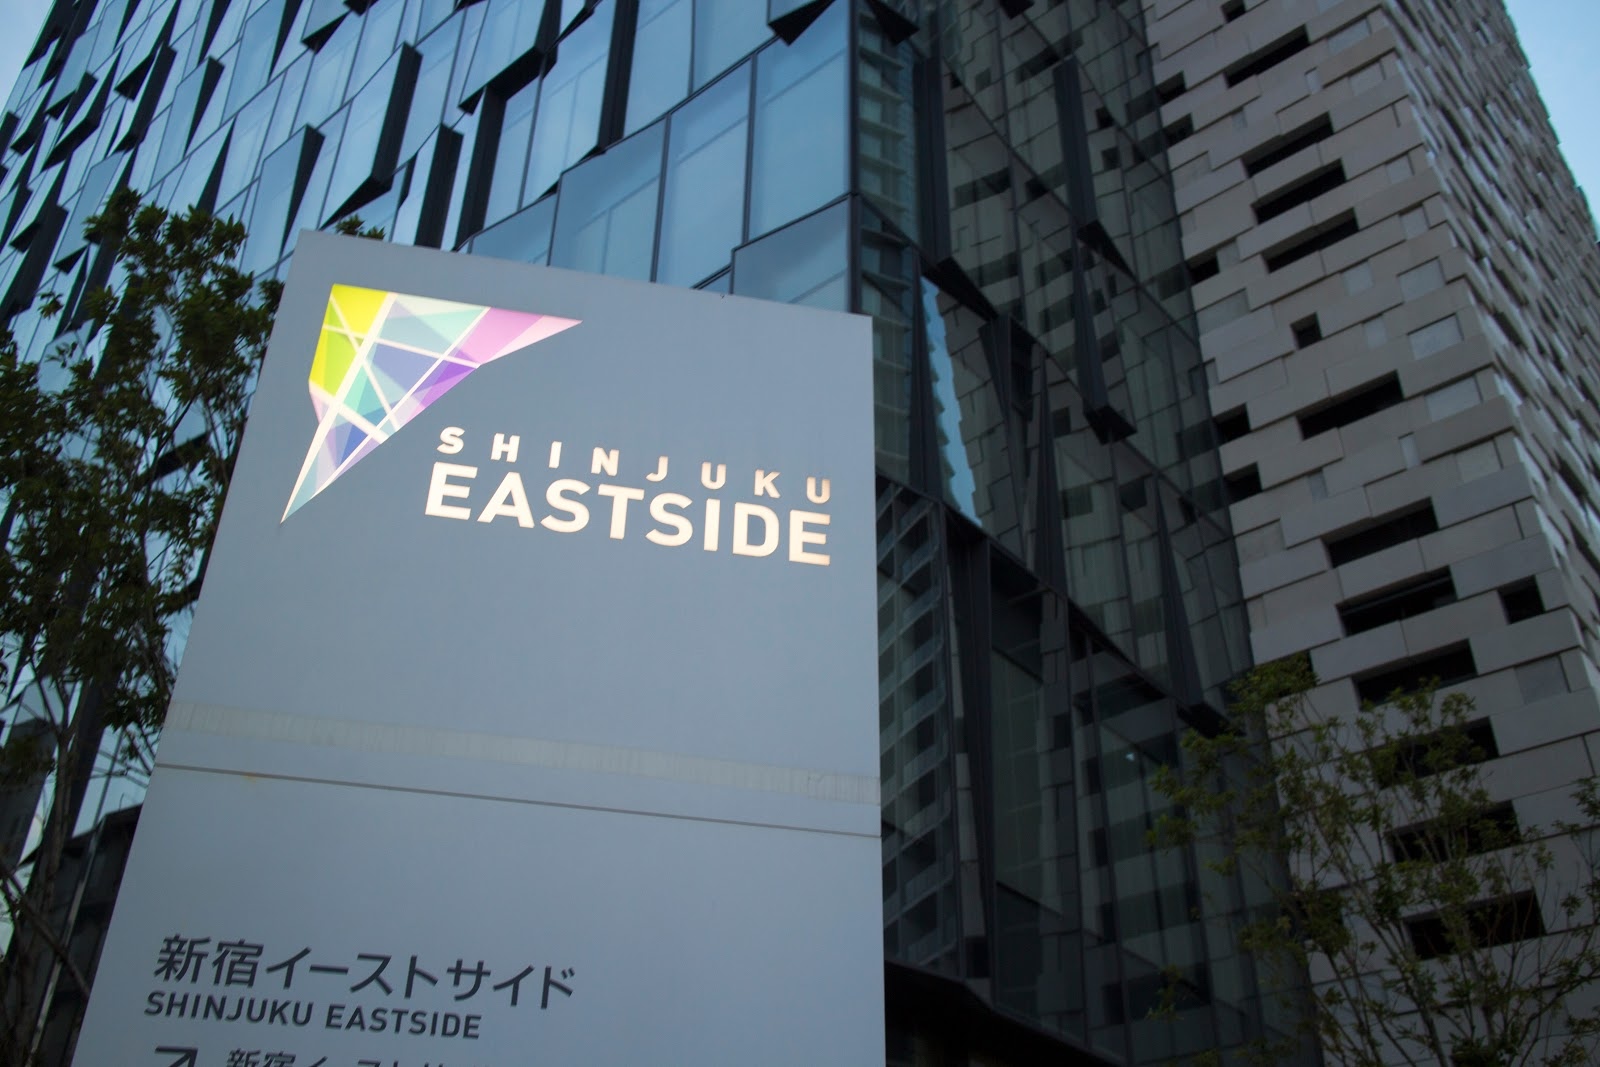 Day Ikebukuro Animates New Store Artnia Square Enix Shinjuku - Invoice format for services rendered square enix online store